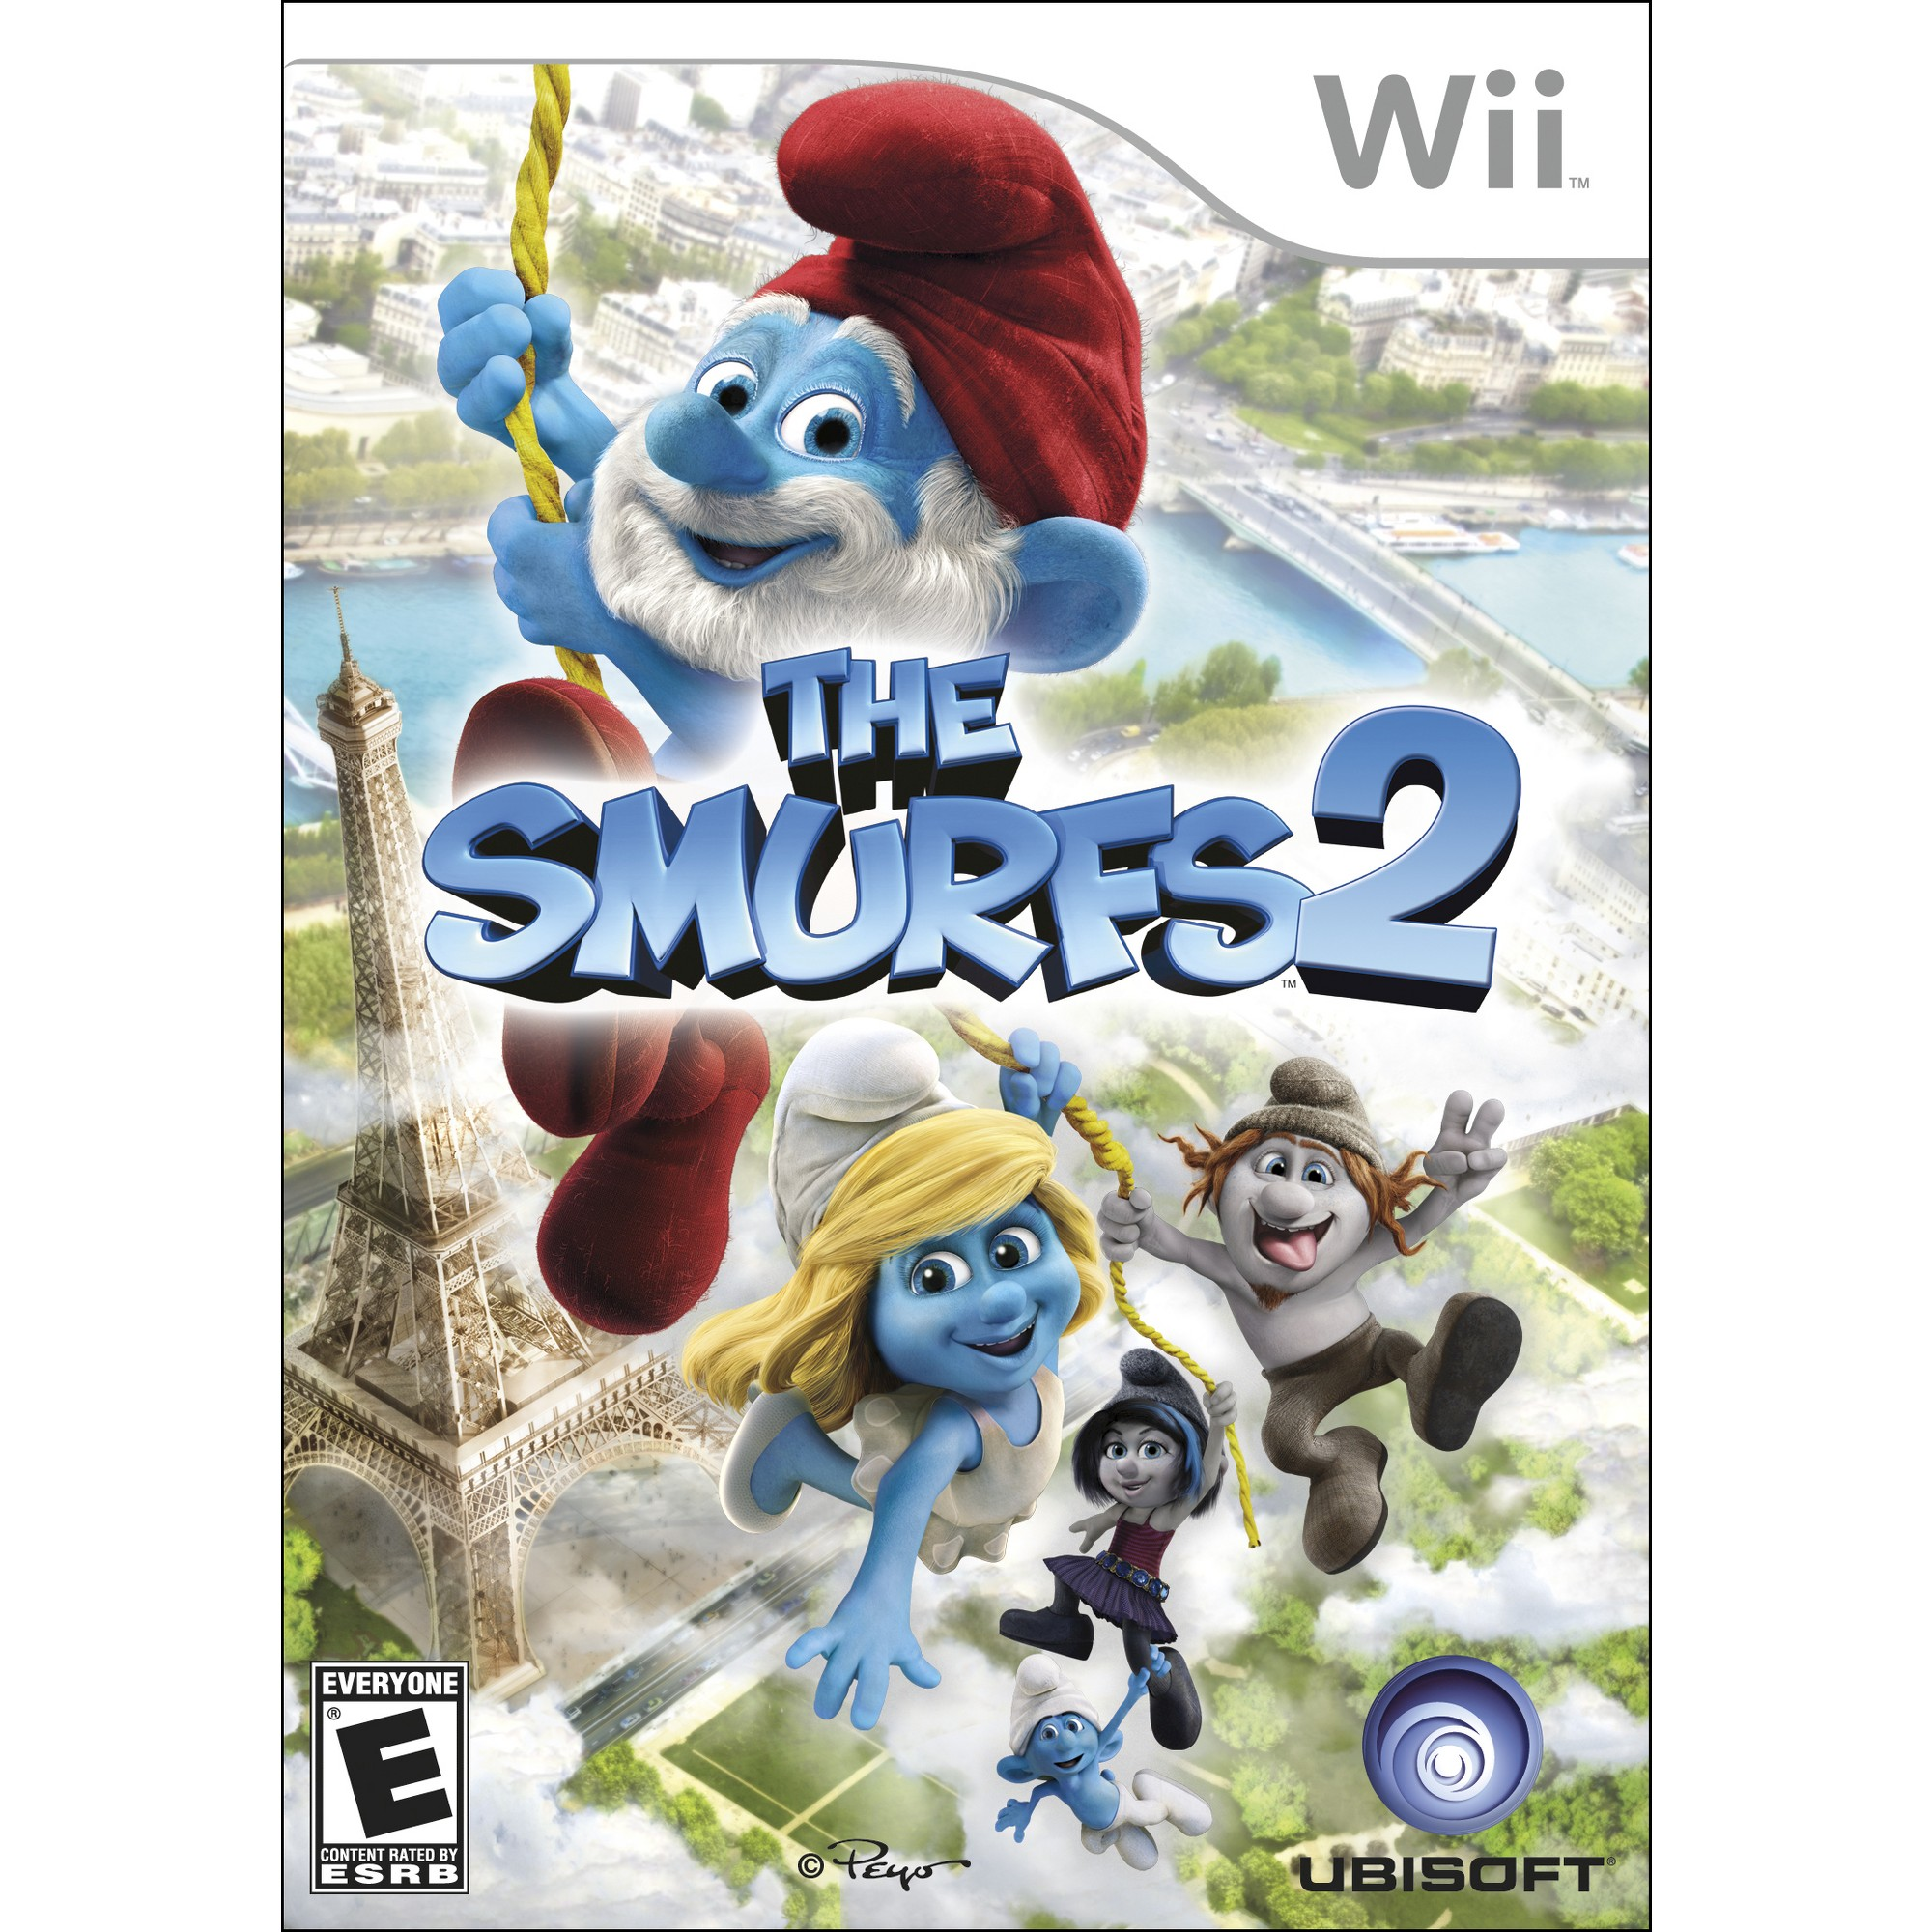 Smurfs 2 Nintendo Wii Video Games Fun Video Games